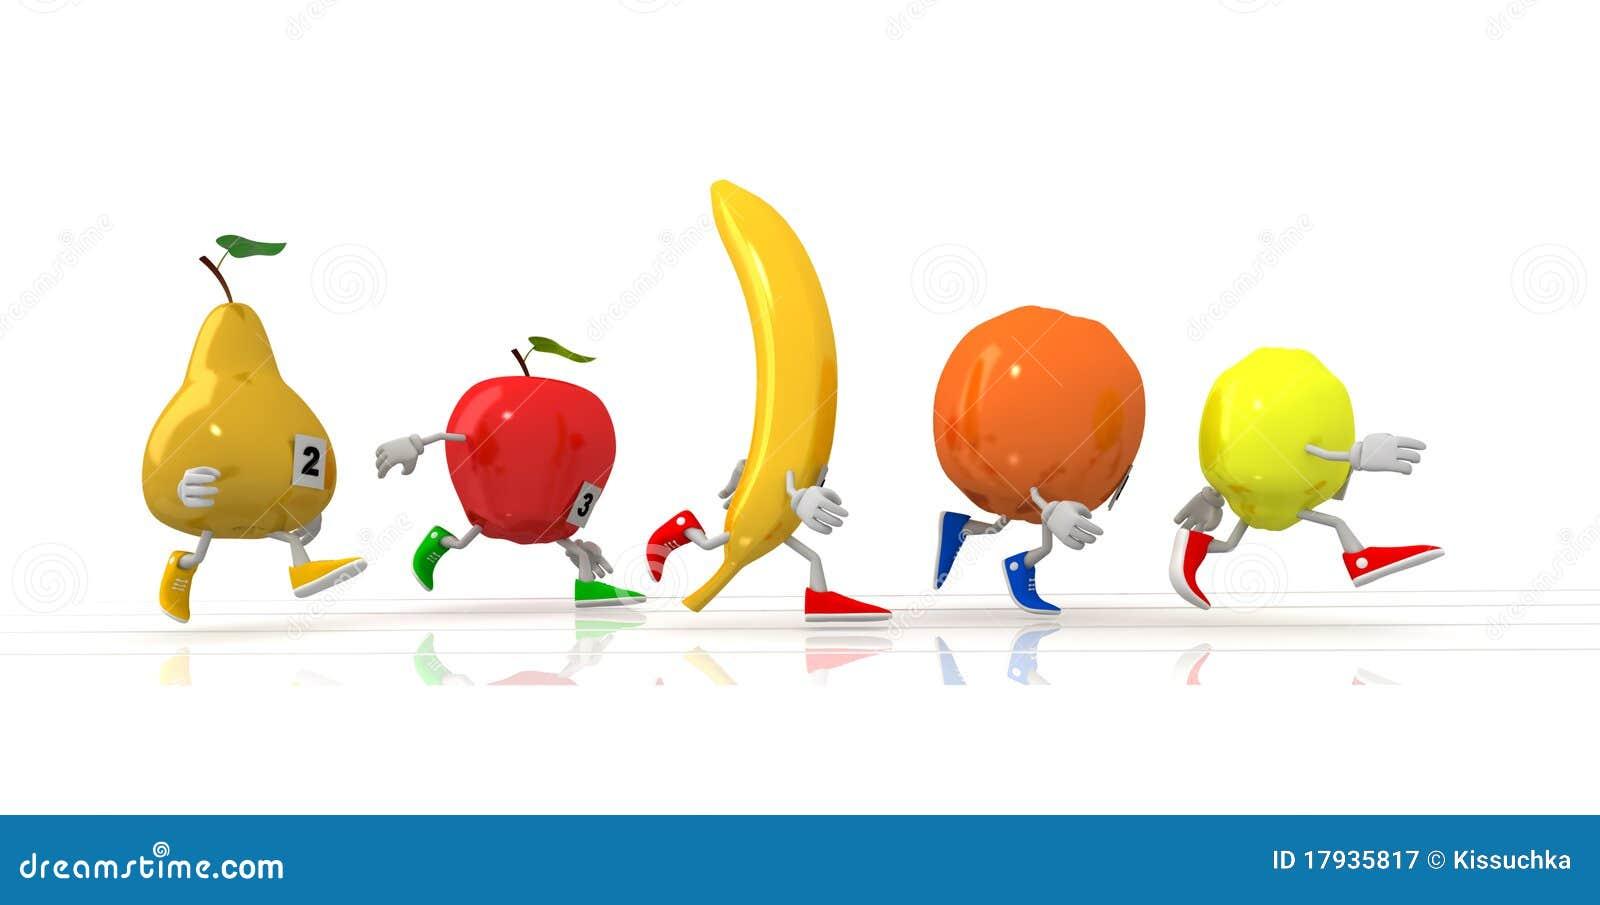 Running Fruit Royalty Free Stock Photography Image 17935817